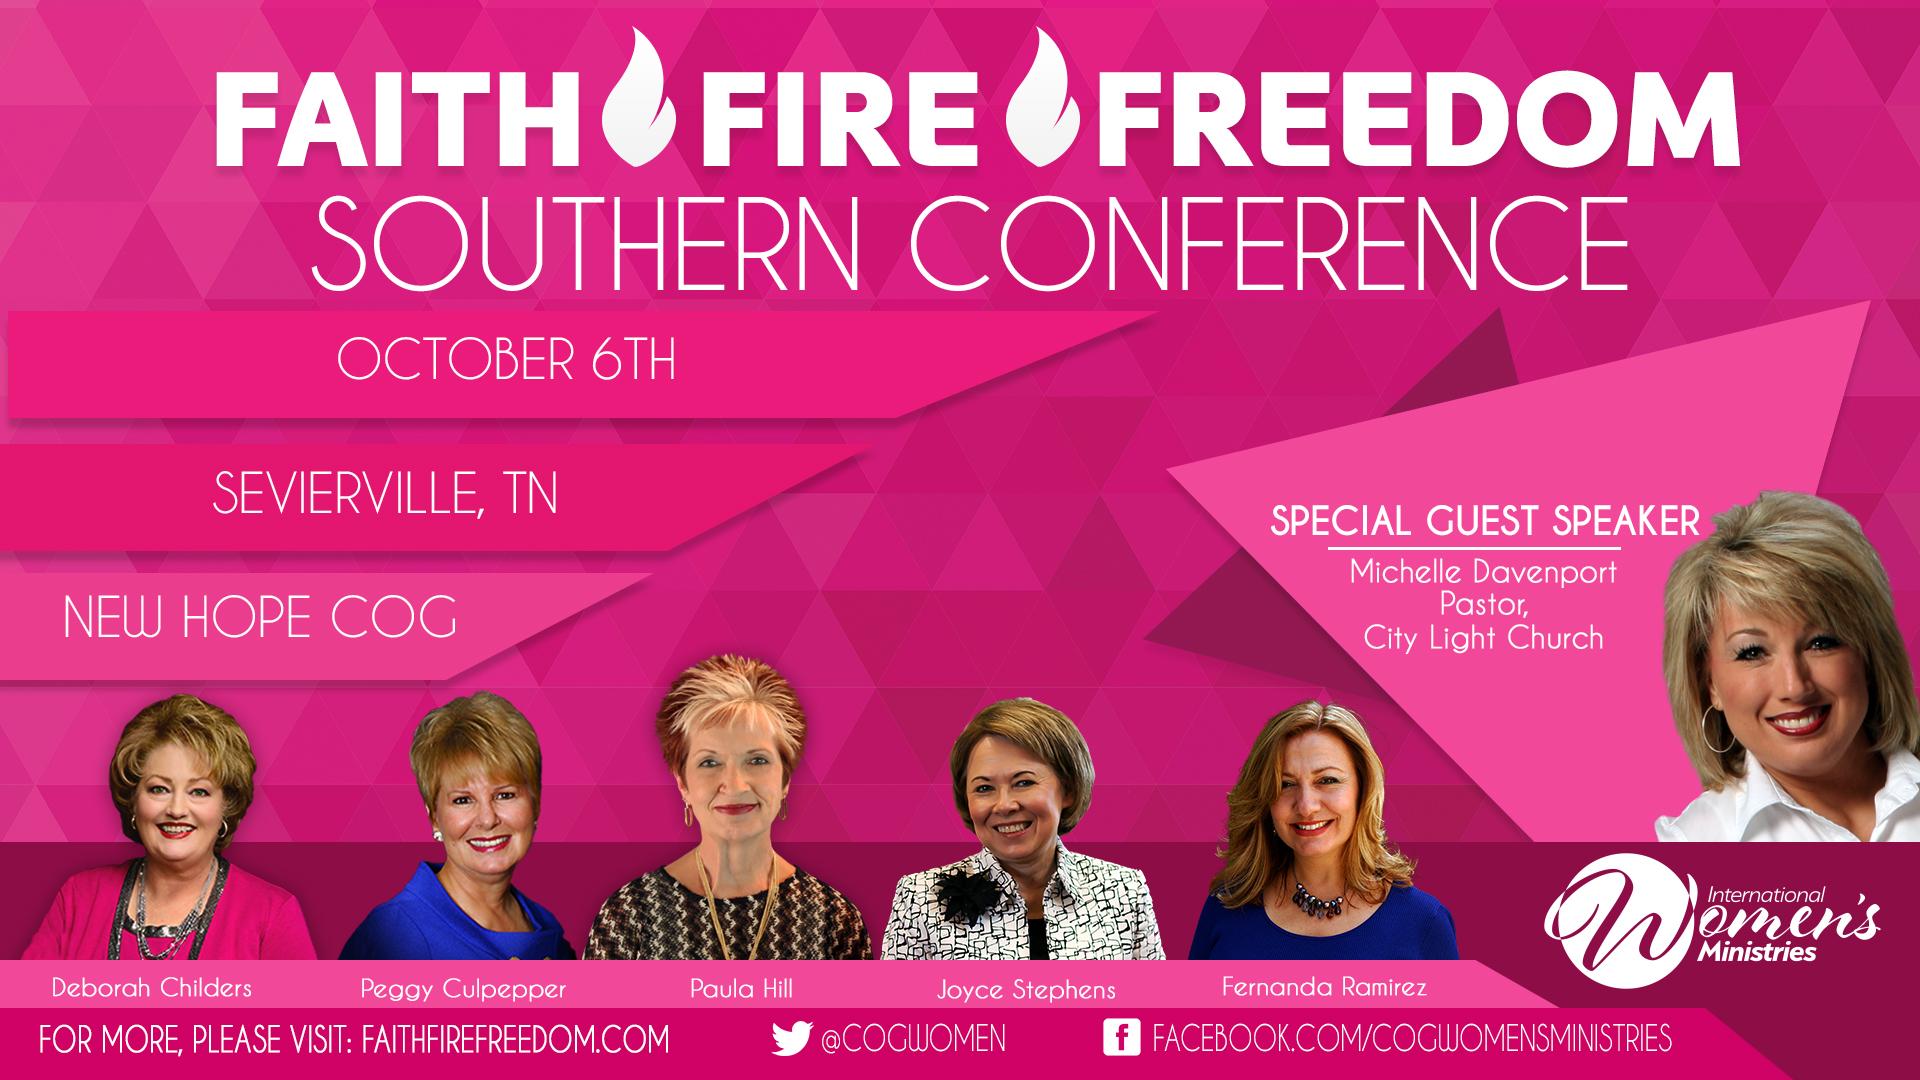 faith-fire-freedom-southernconf-slide.jpg